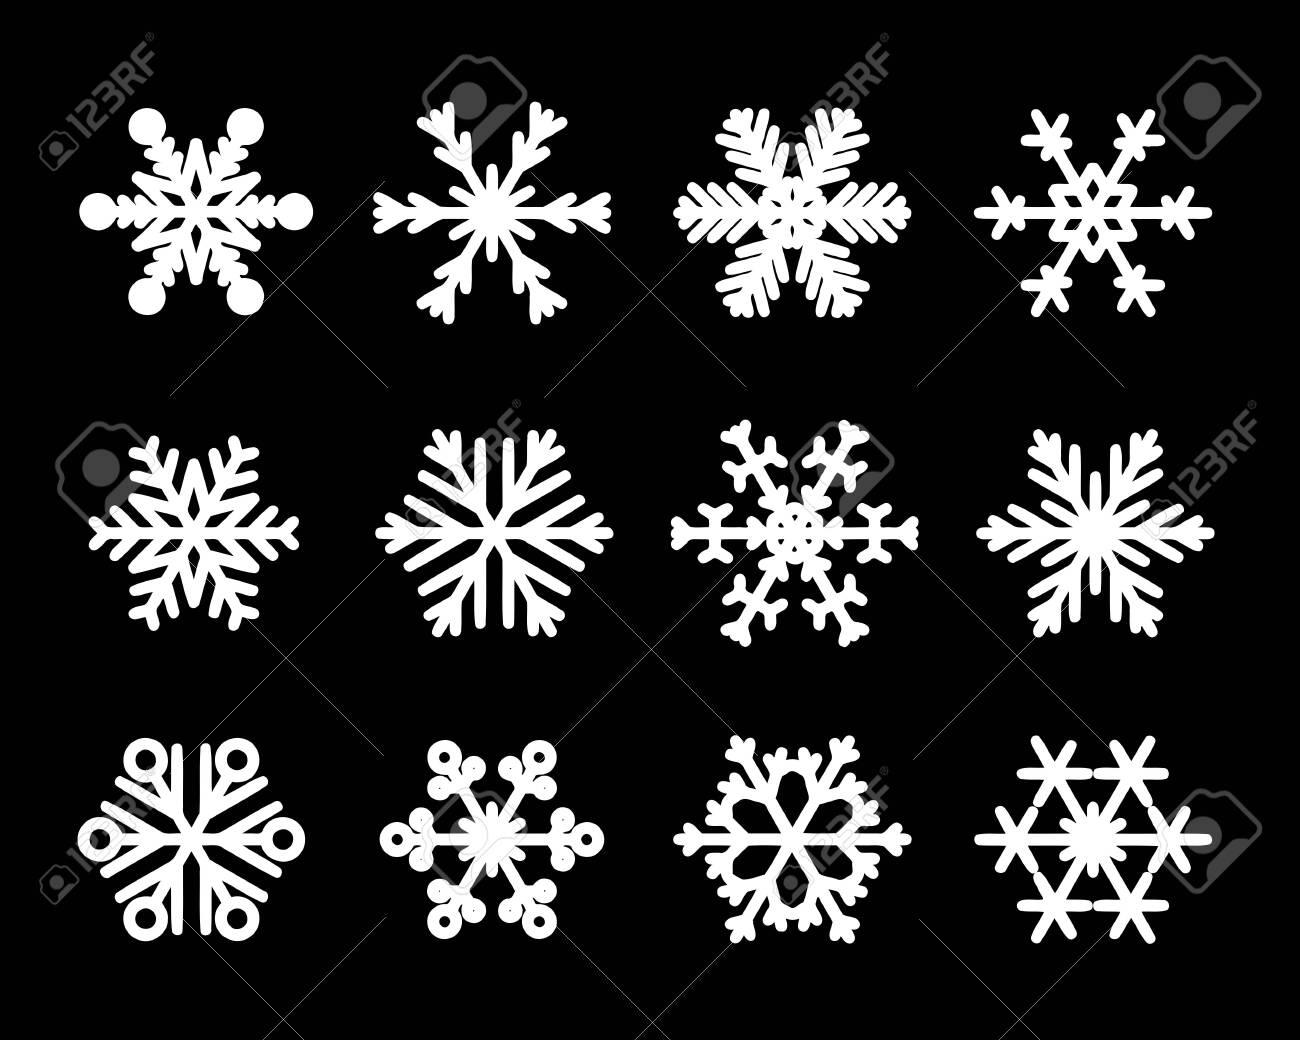 Vector isolated snowflakes. Christmas snow flake icon set. - 137800091